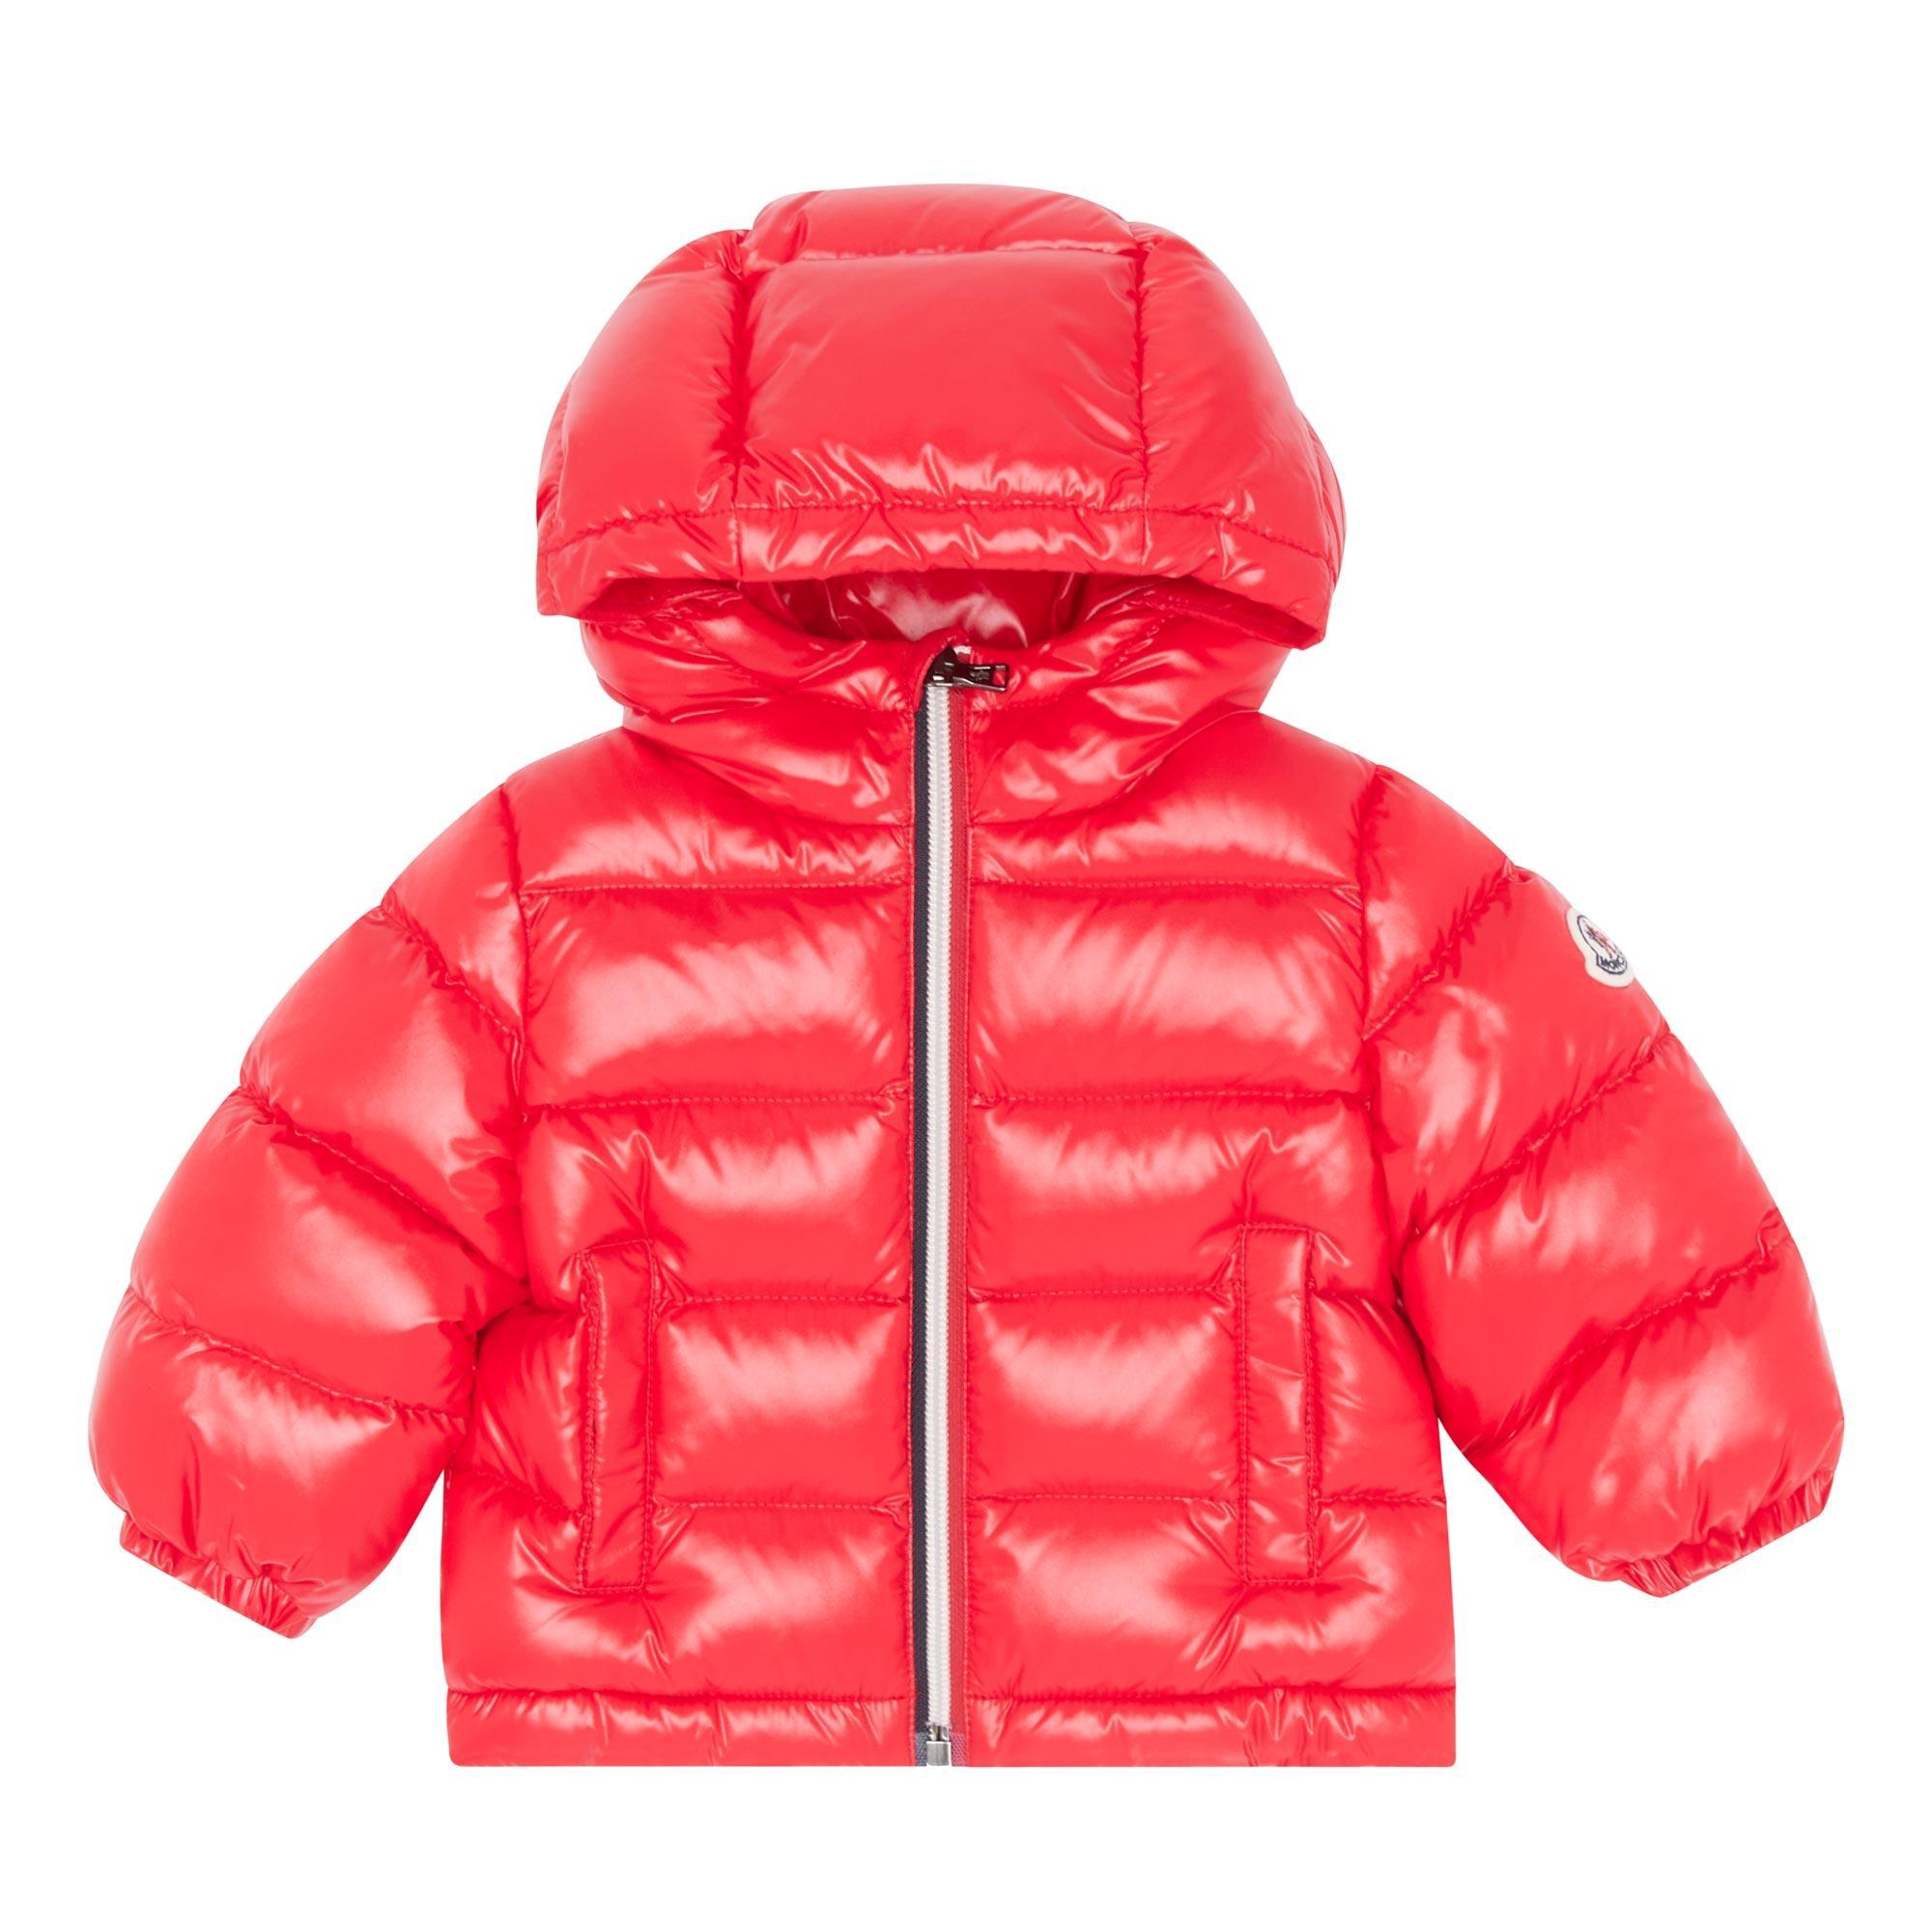 New Aubert Jacket